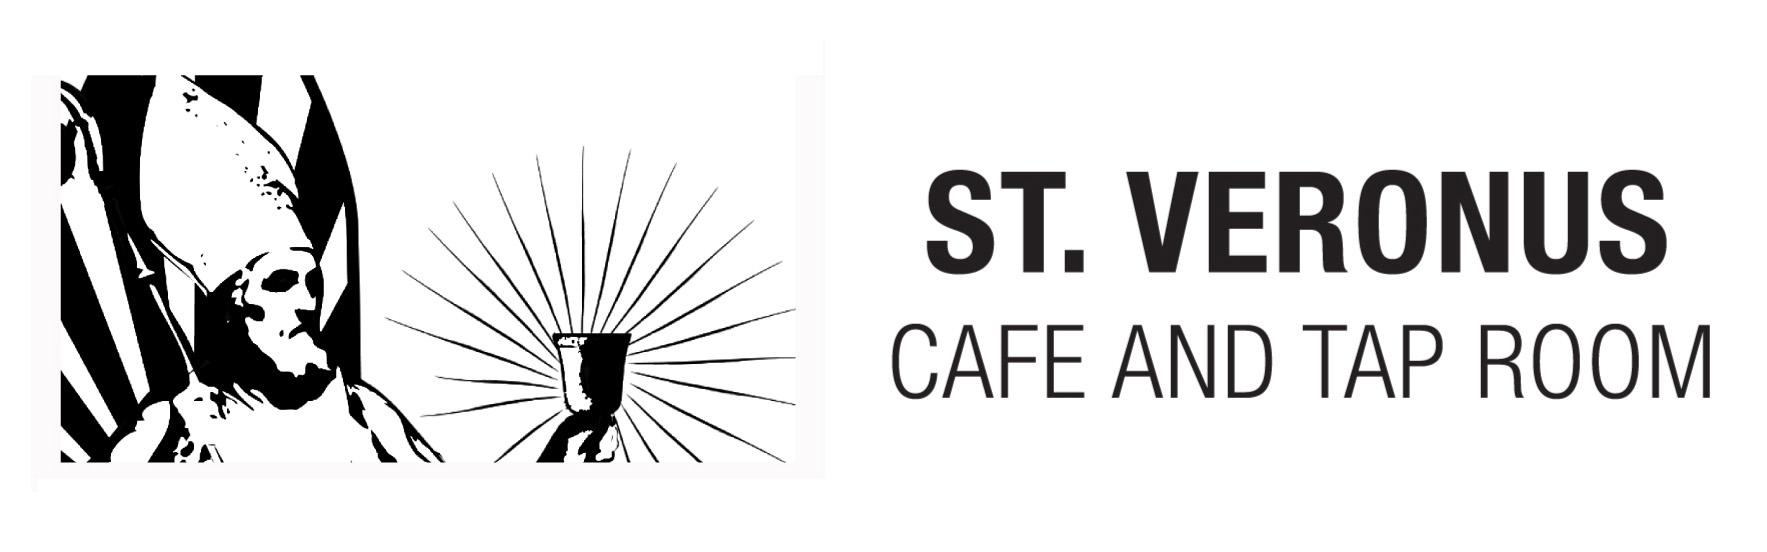 St Veronus Logo 2015 cropped